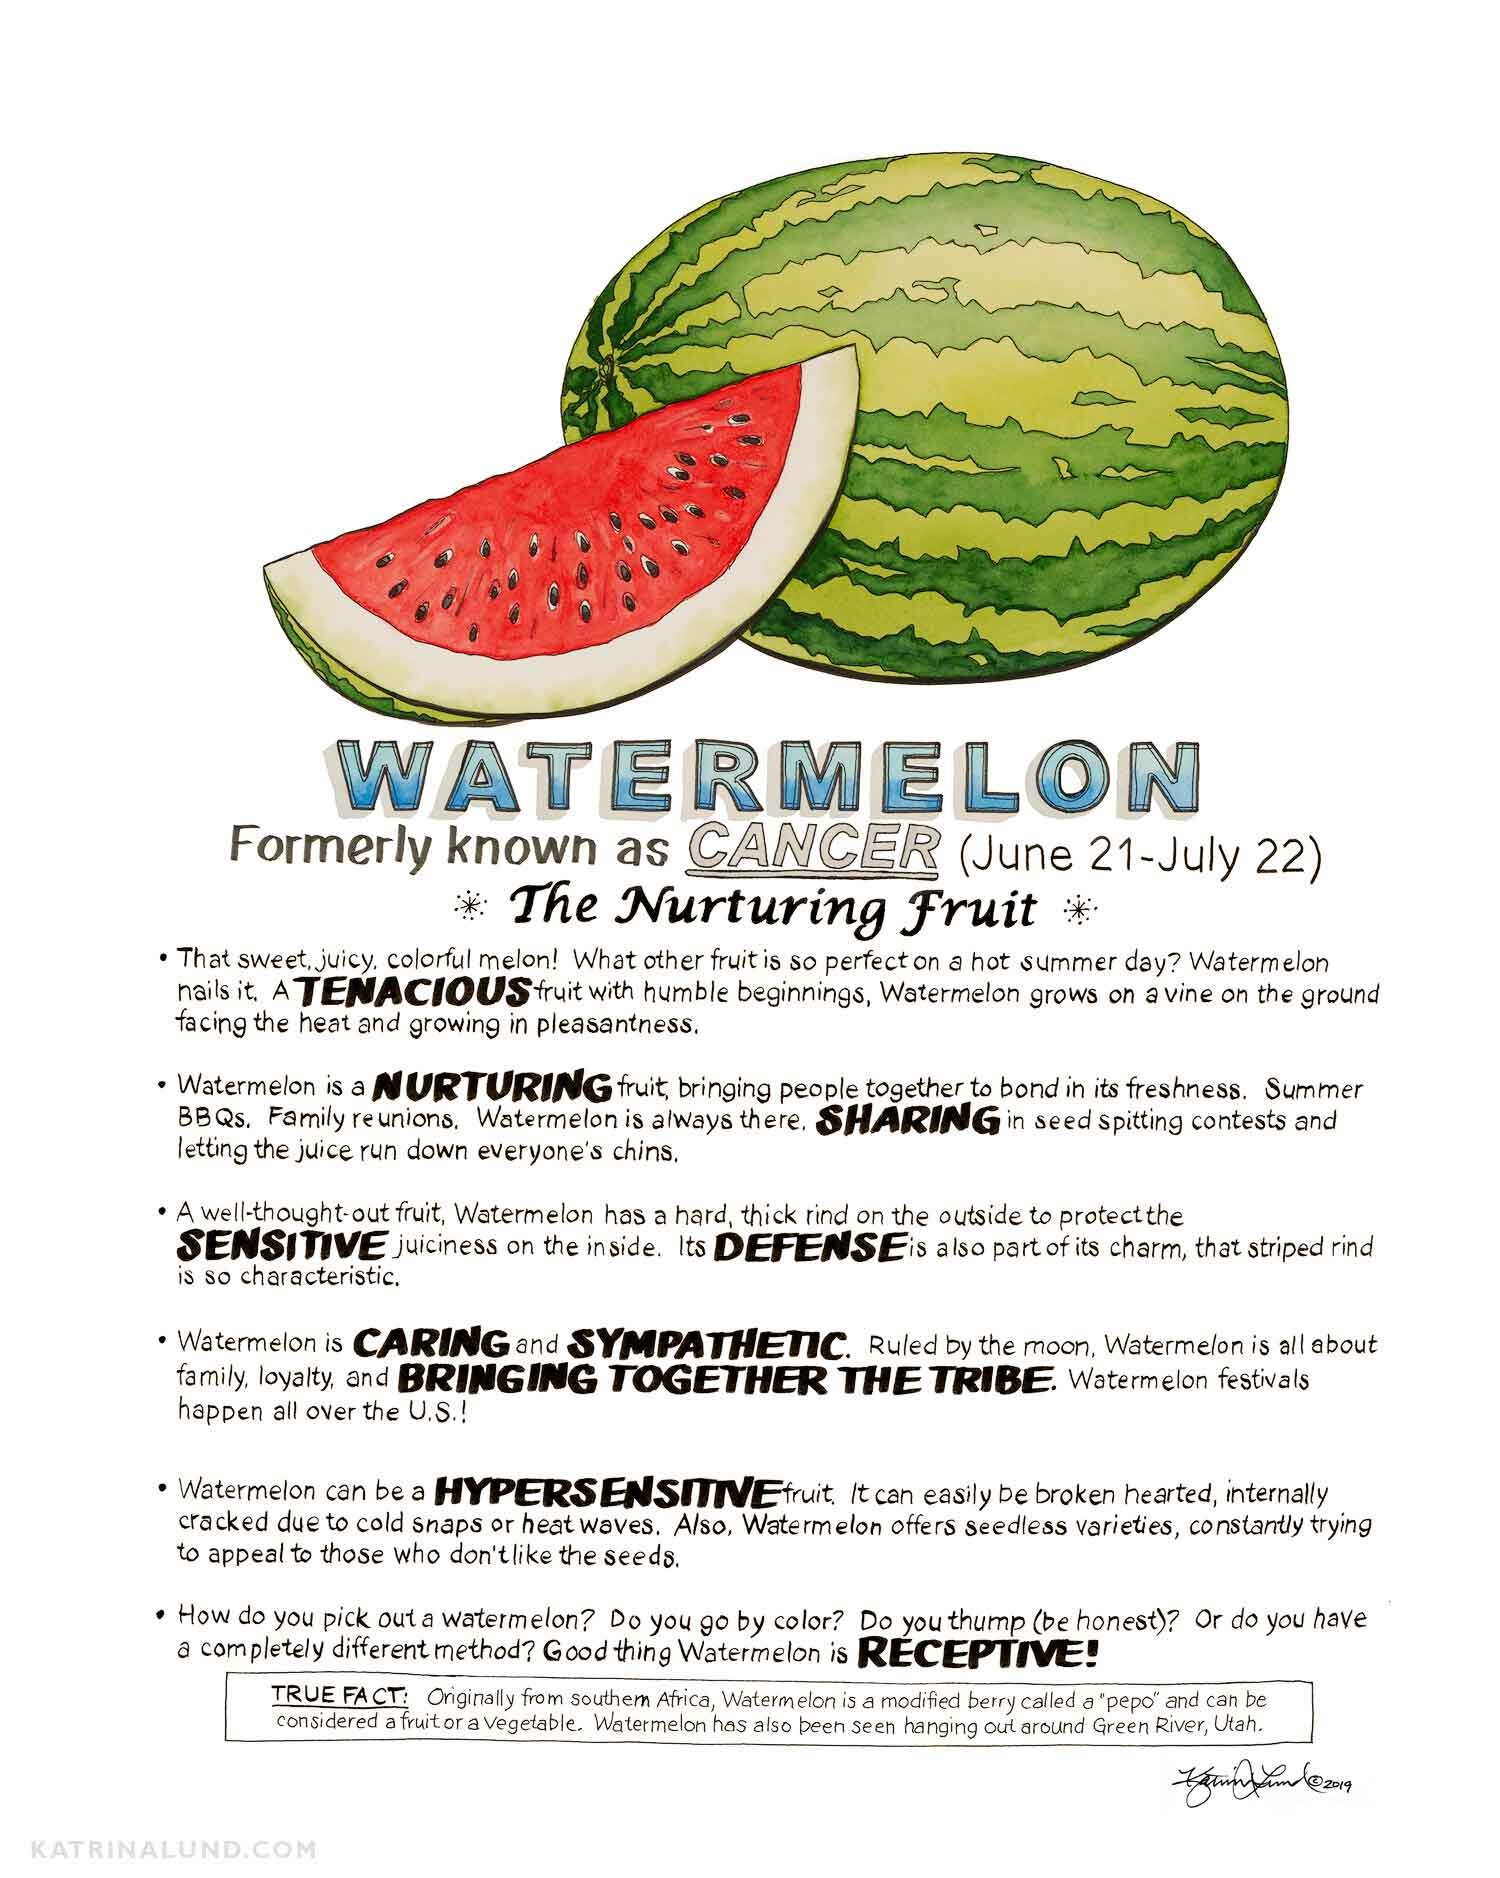 KatrinaLundArt_FruitAstrology_Watermelon_web.jpg